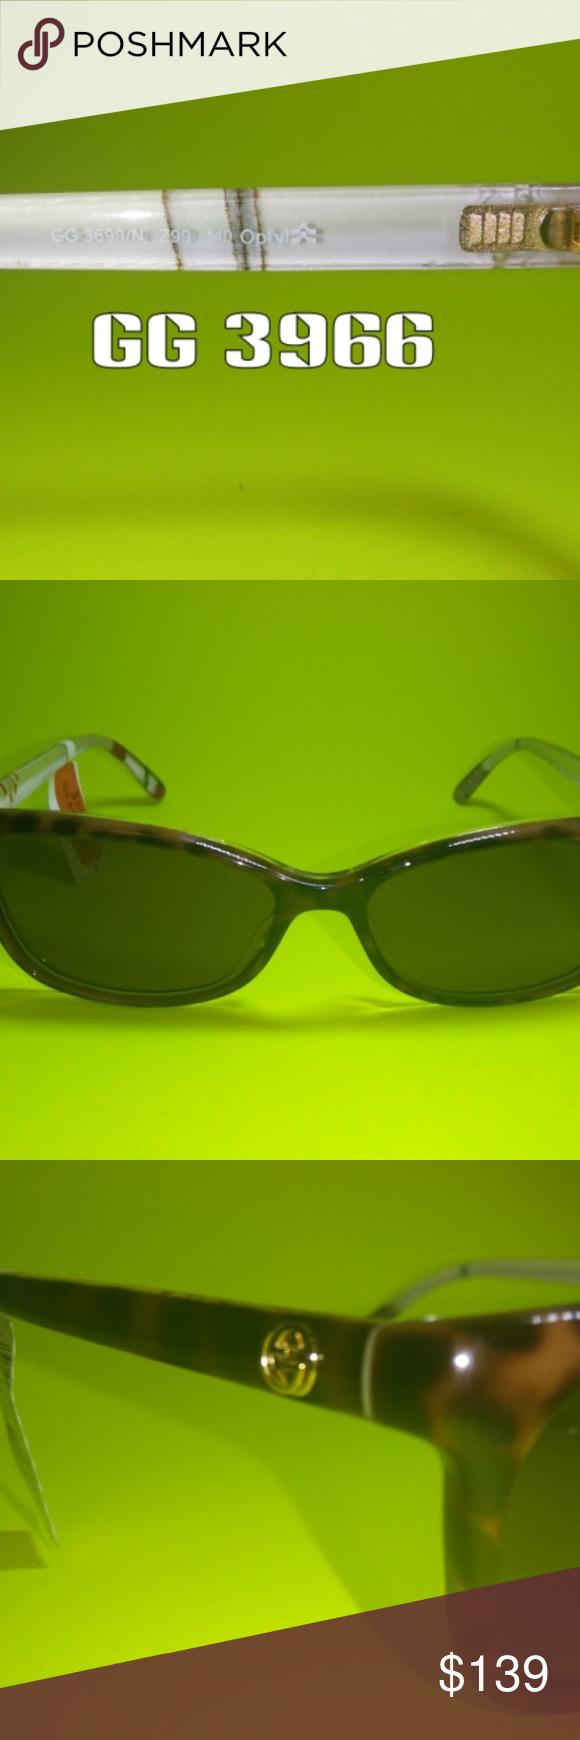 0c984bfa896 Gucci GG 3699 N Z99 Havana Floral These Gucci GG 3699 N glasses in